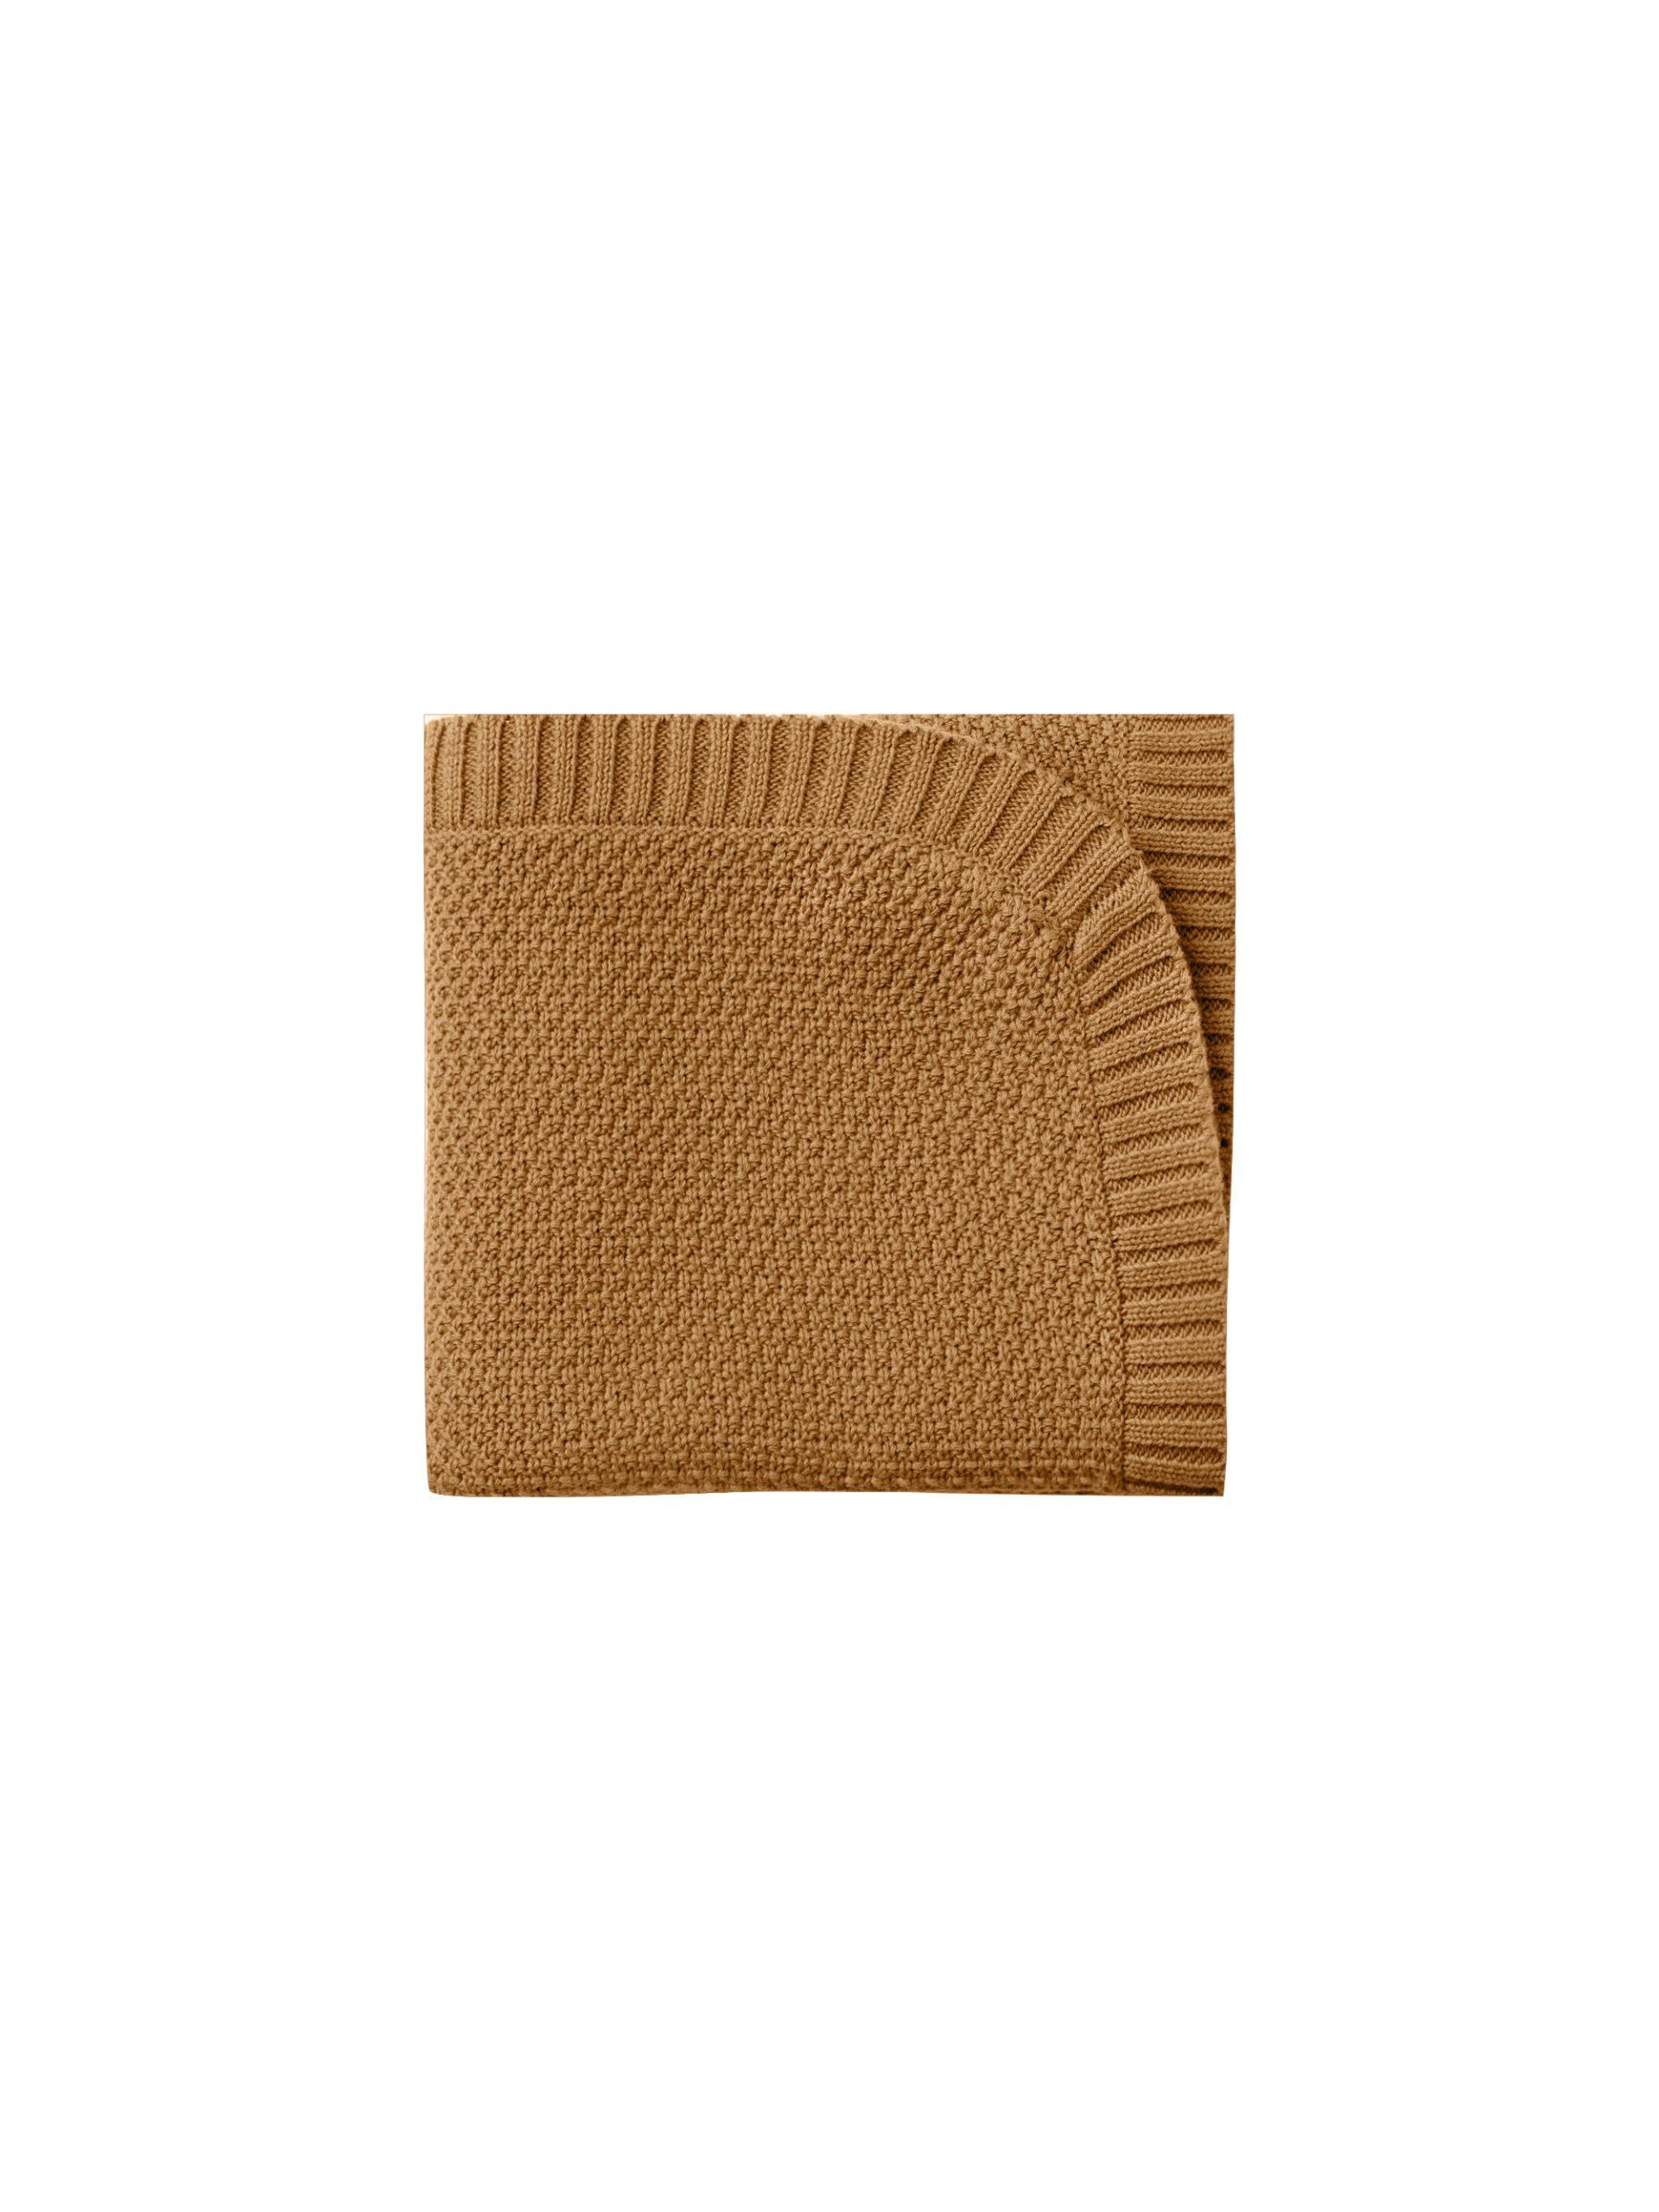 Quincy Mae Chunky Knit Baby Blanket (walnut)**PRE ORDER